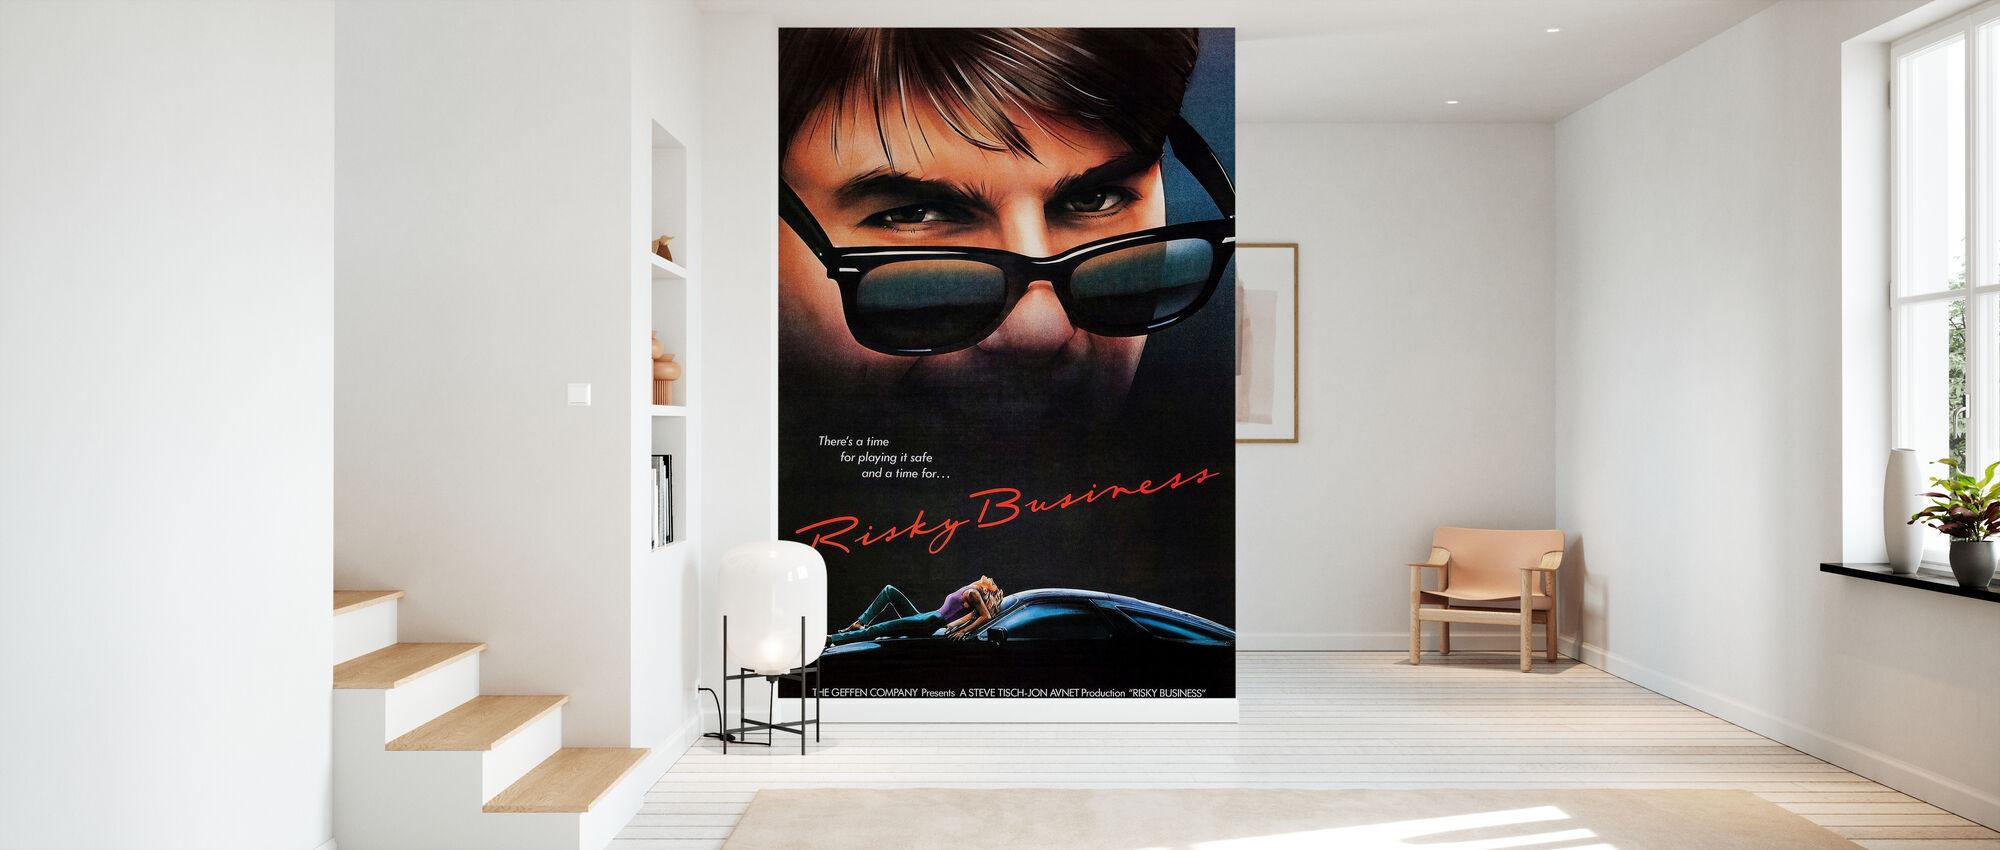 Movie Poster Risky Business - Wallpaper - Hallway